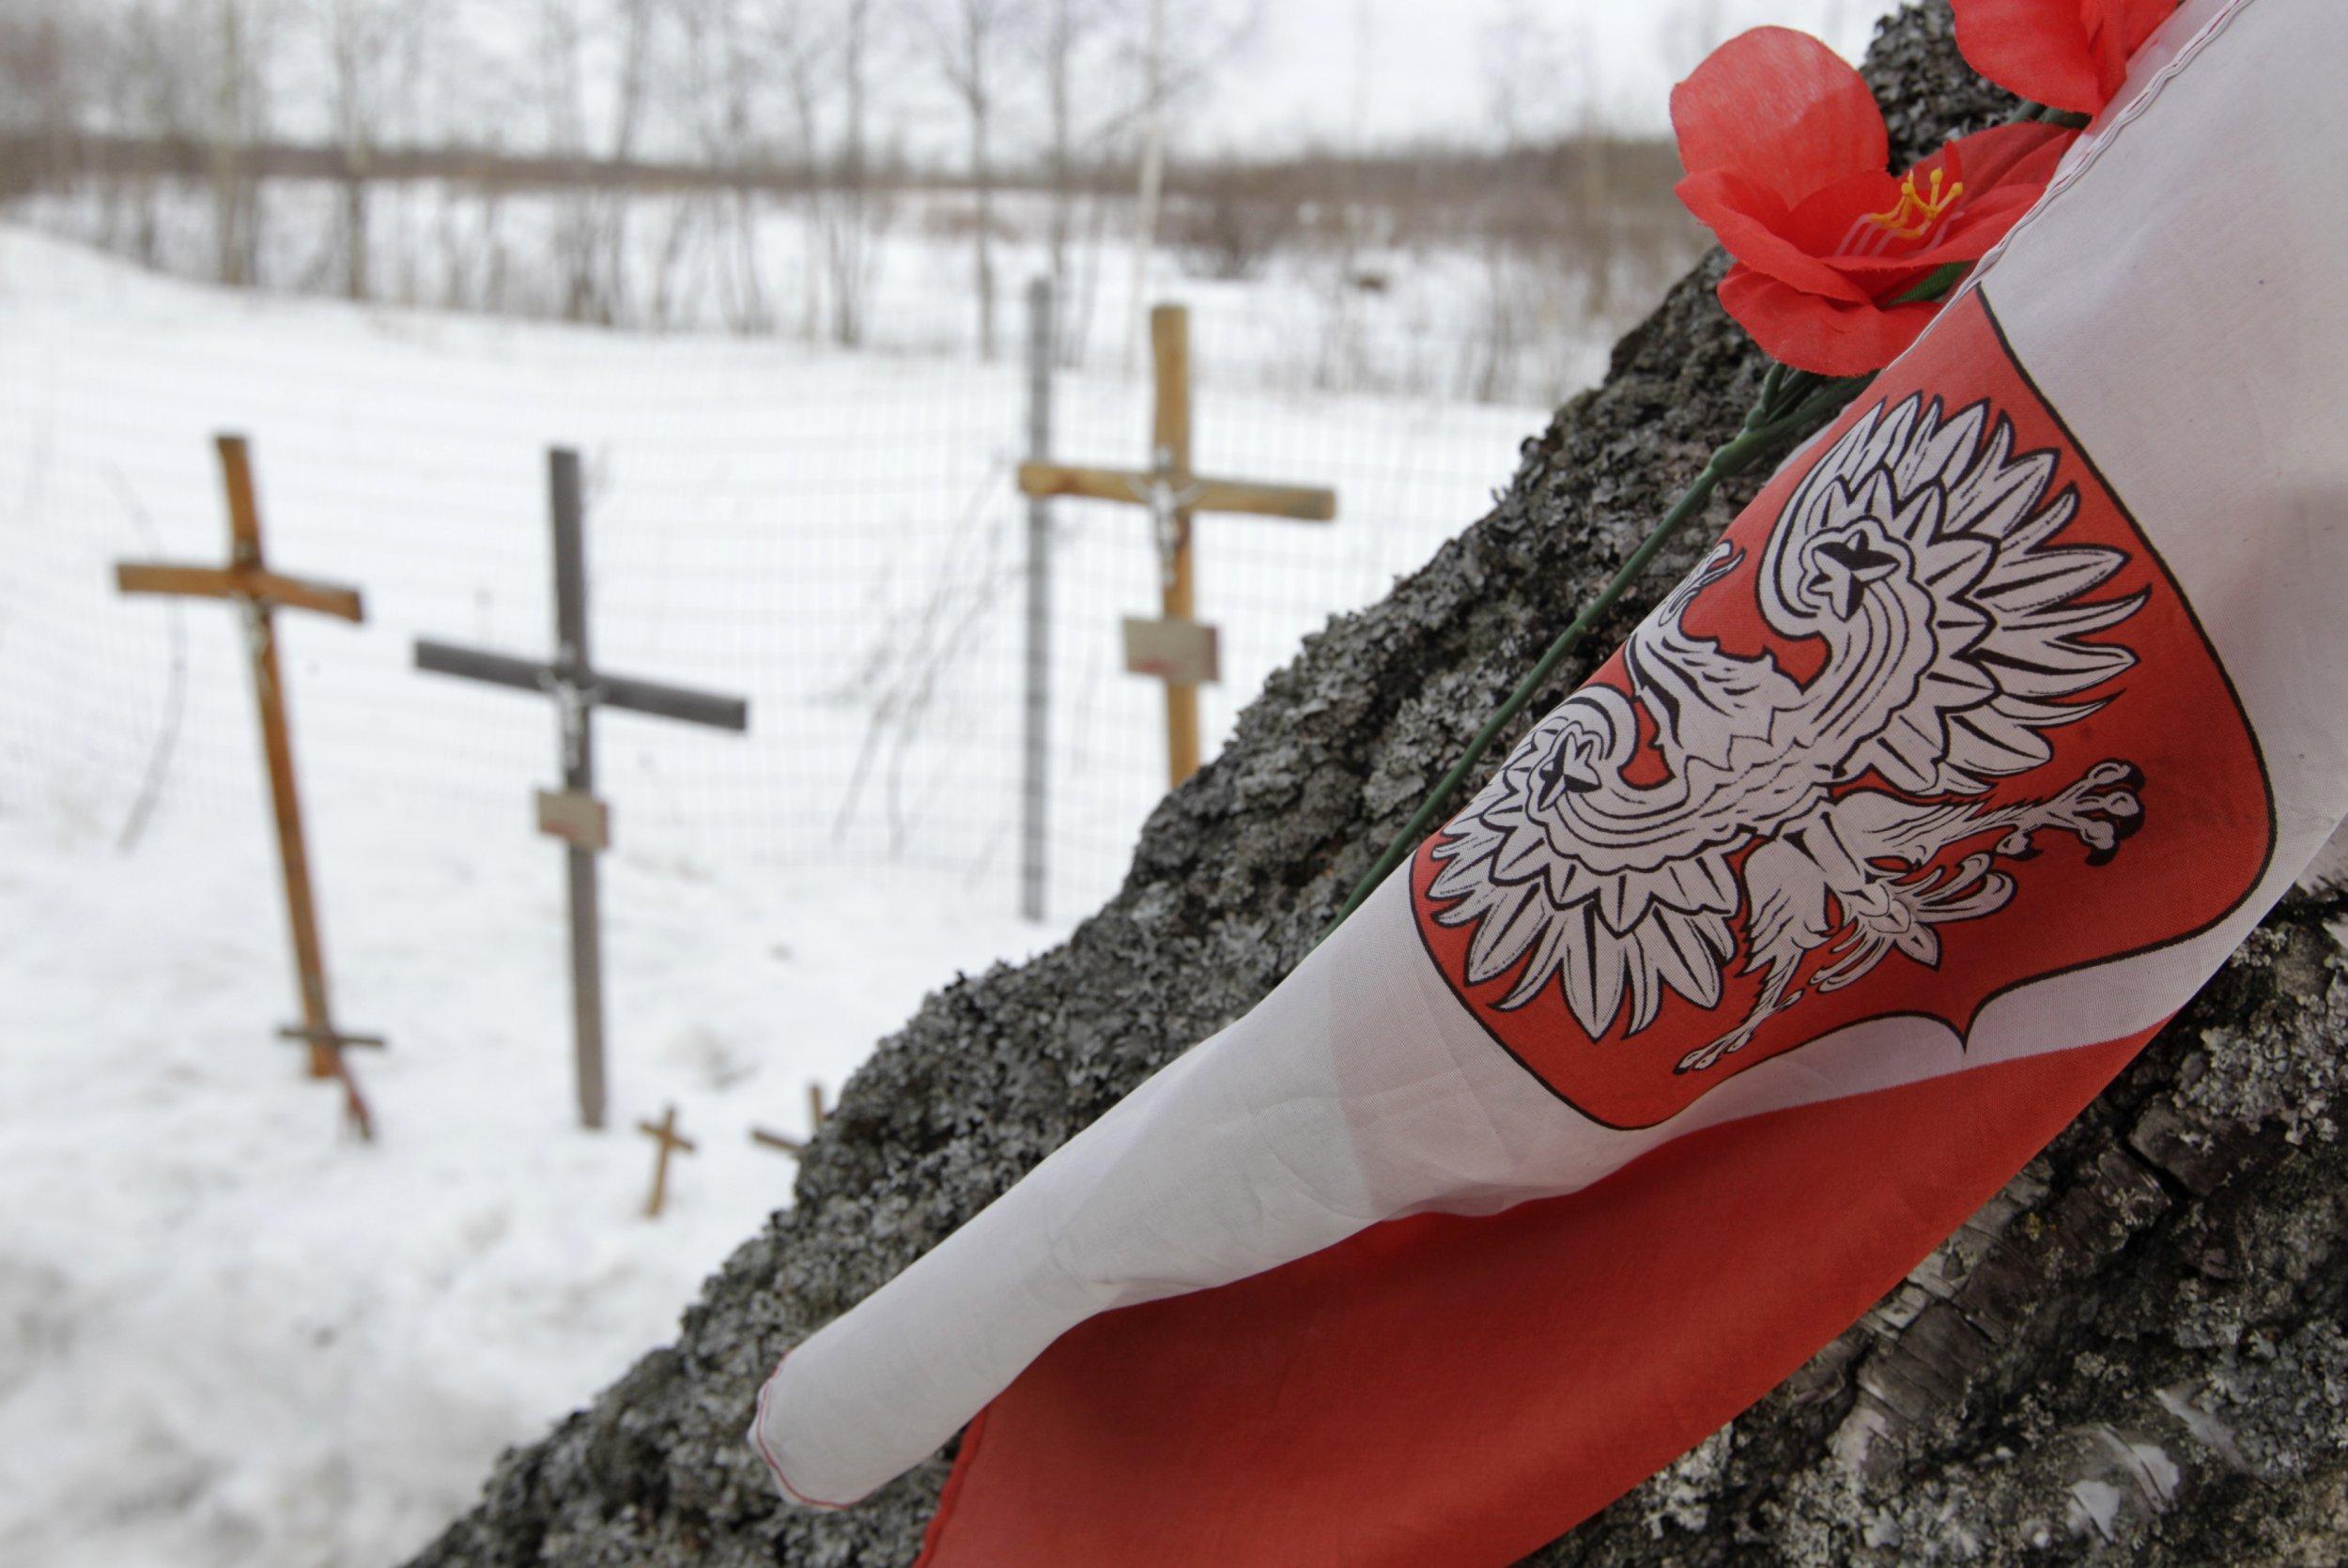 Smolensk air crash 2010